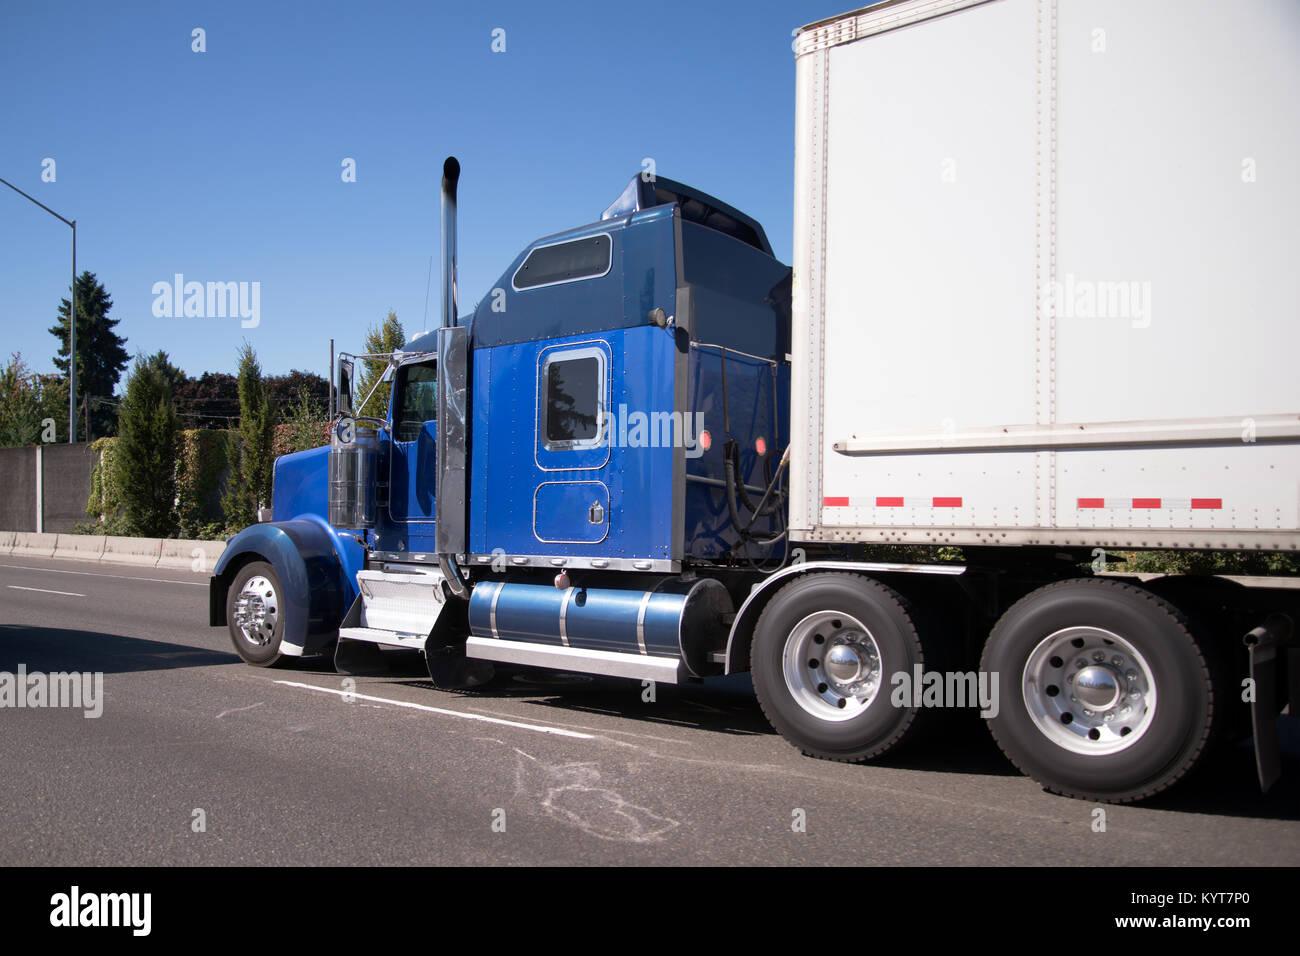 Semi Tractor Accessories : Tractor exhaust stock photos